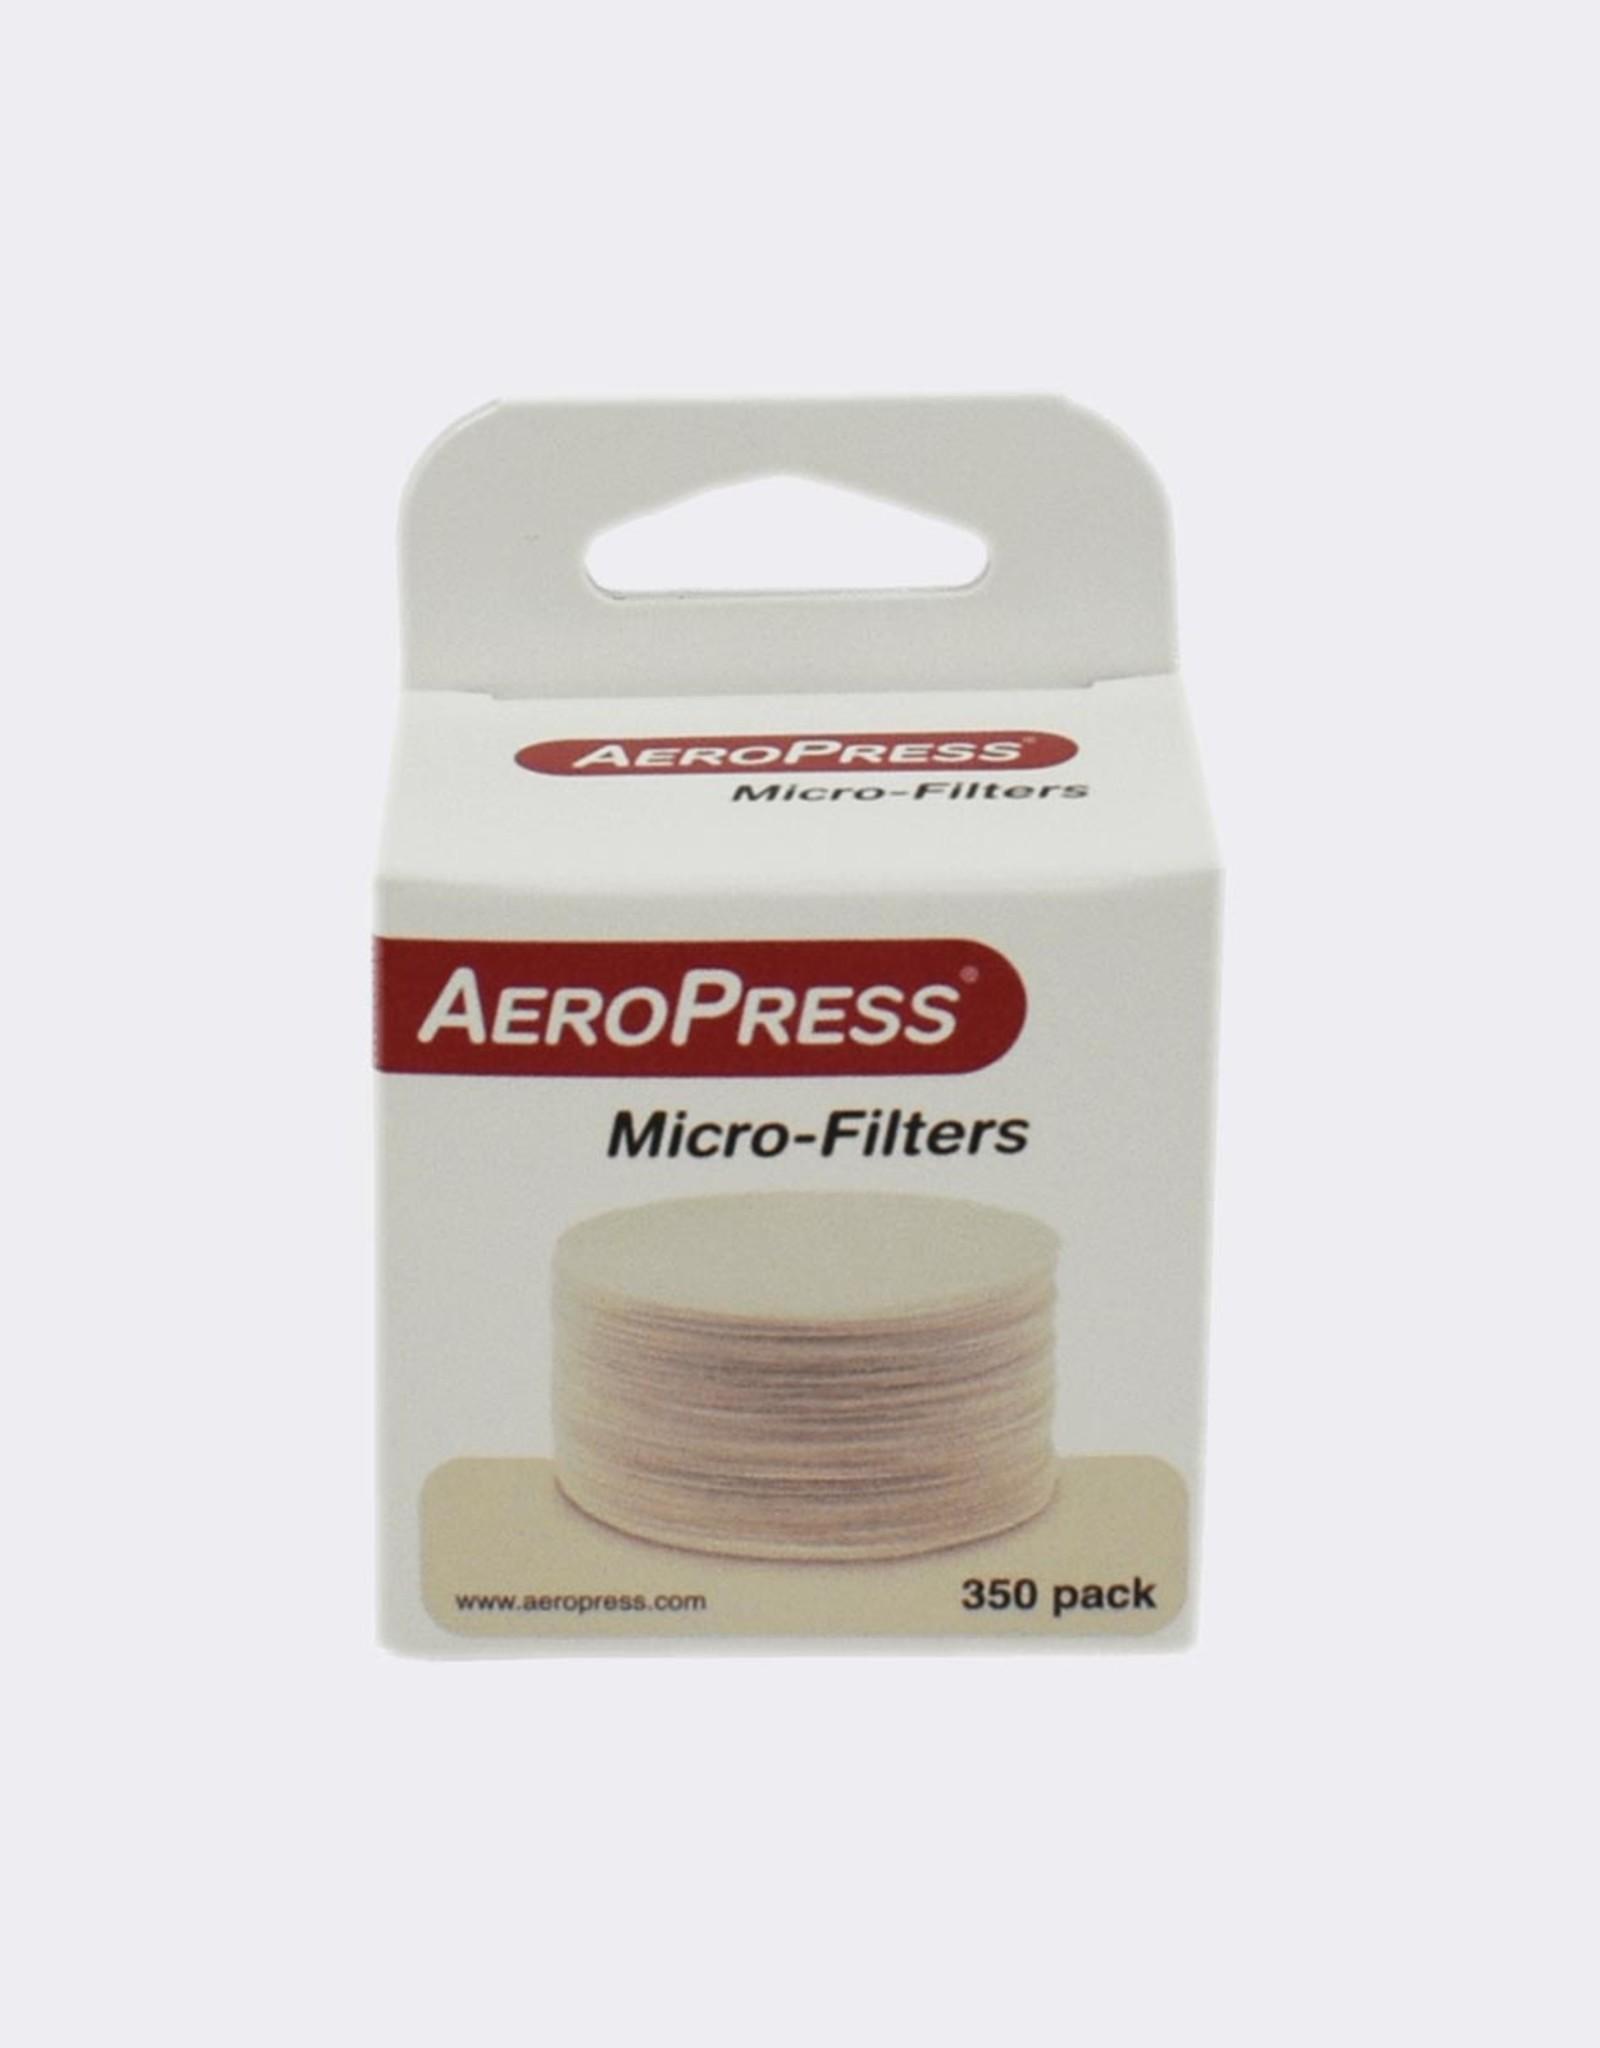 AeroPress AeroPress Micro-Filters